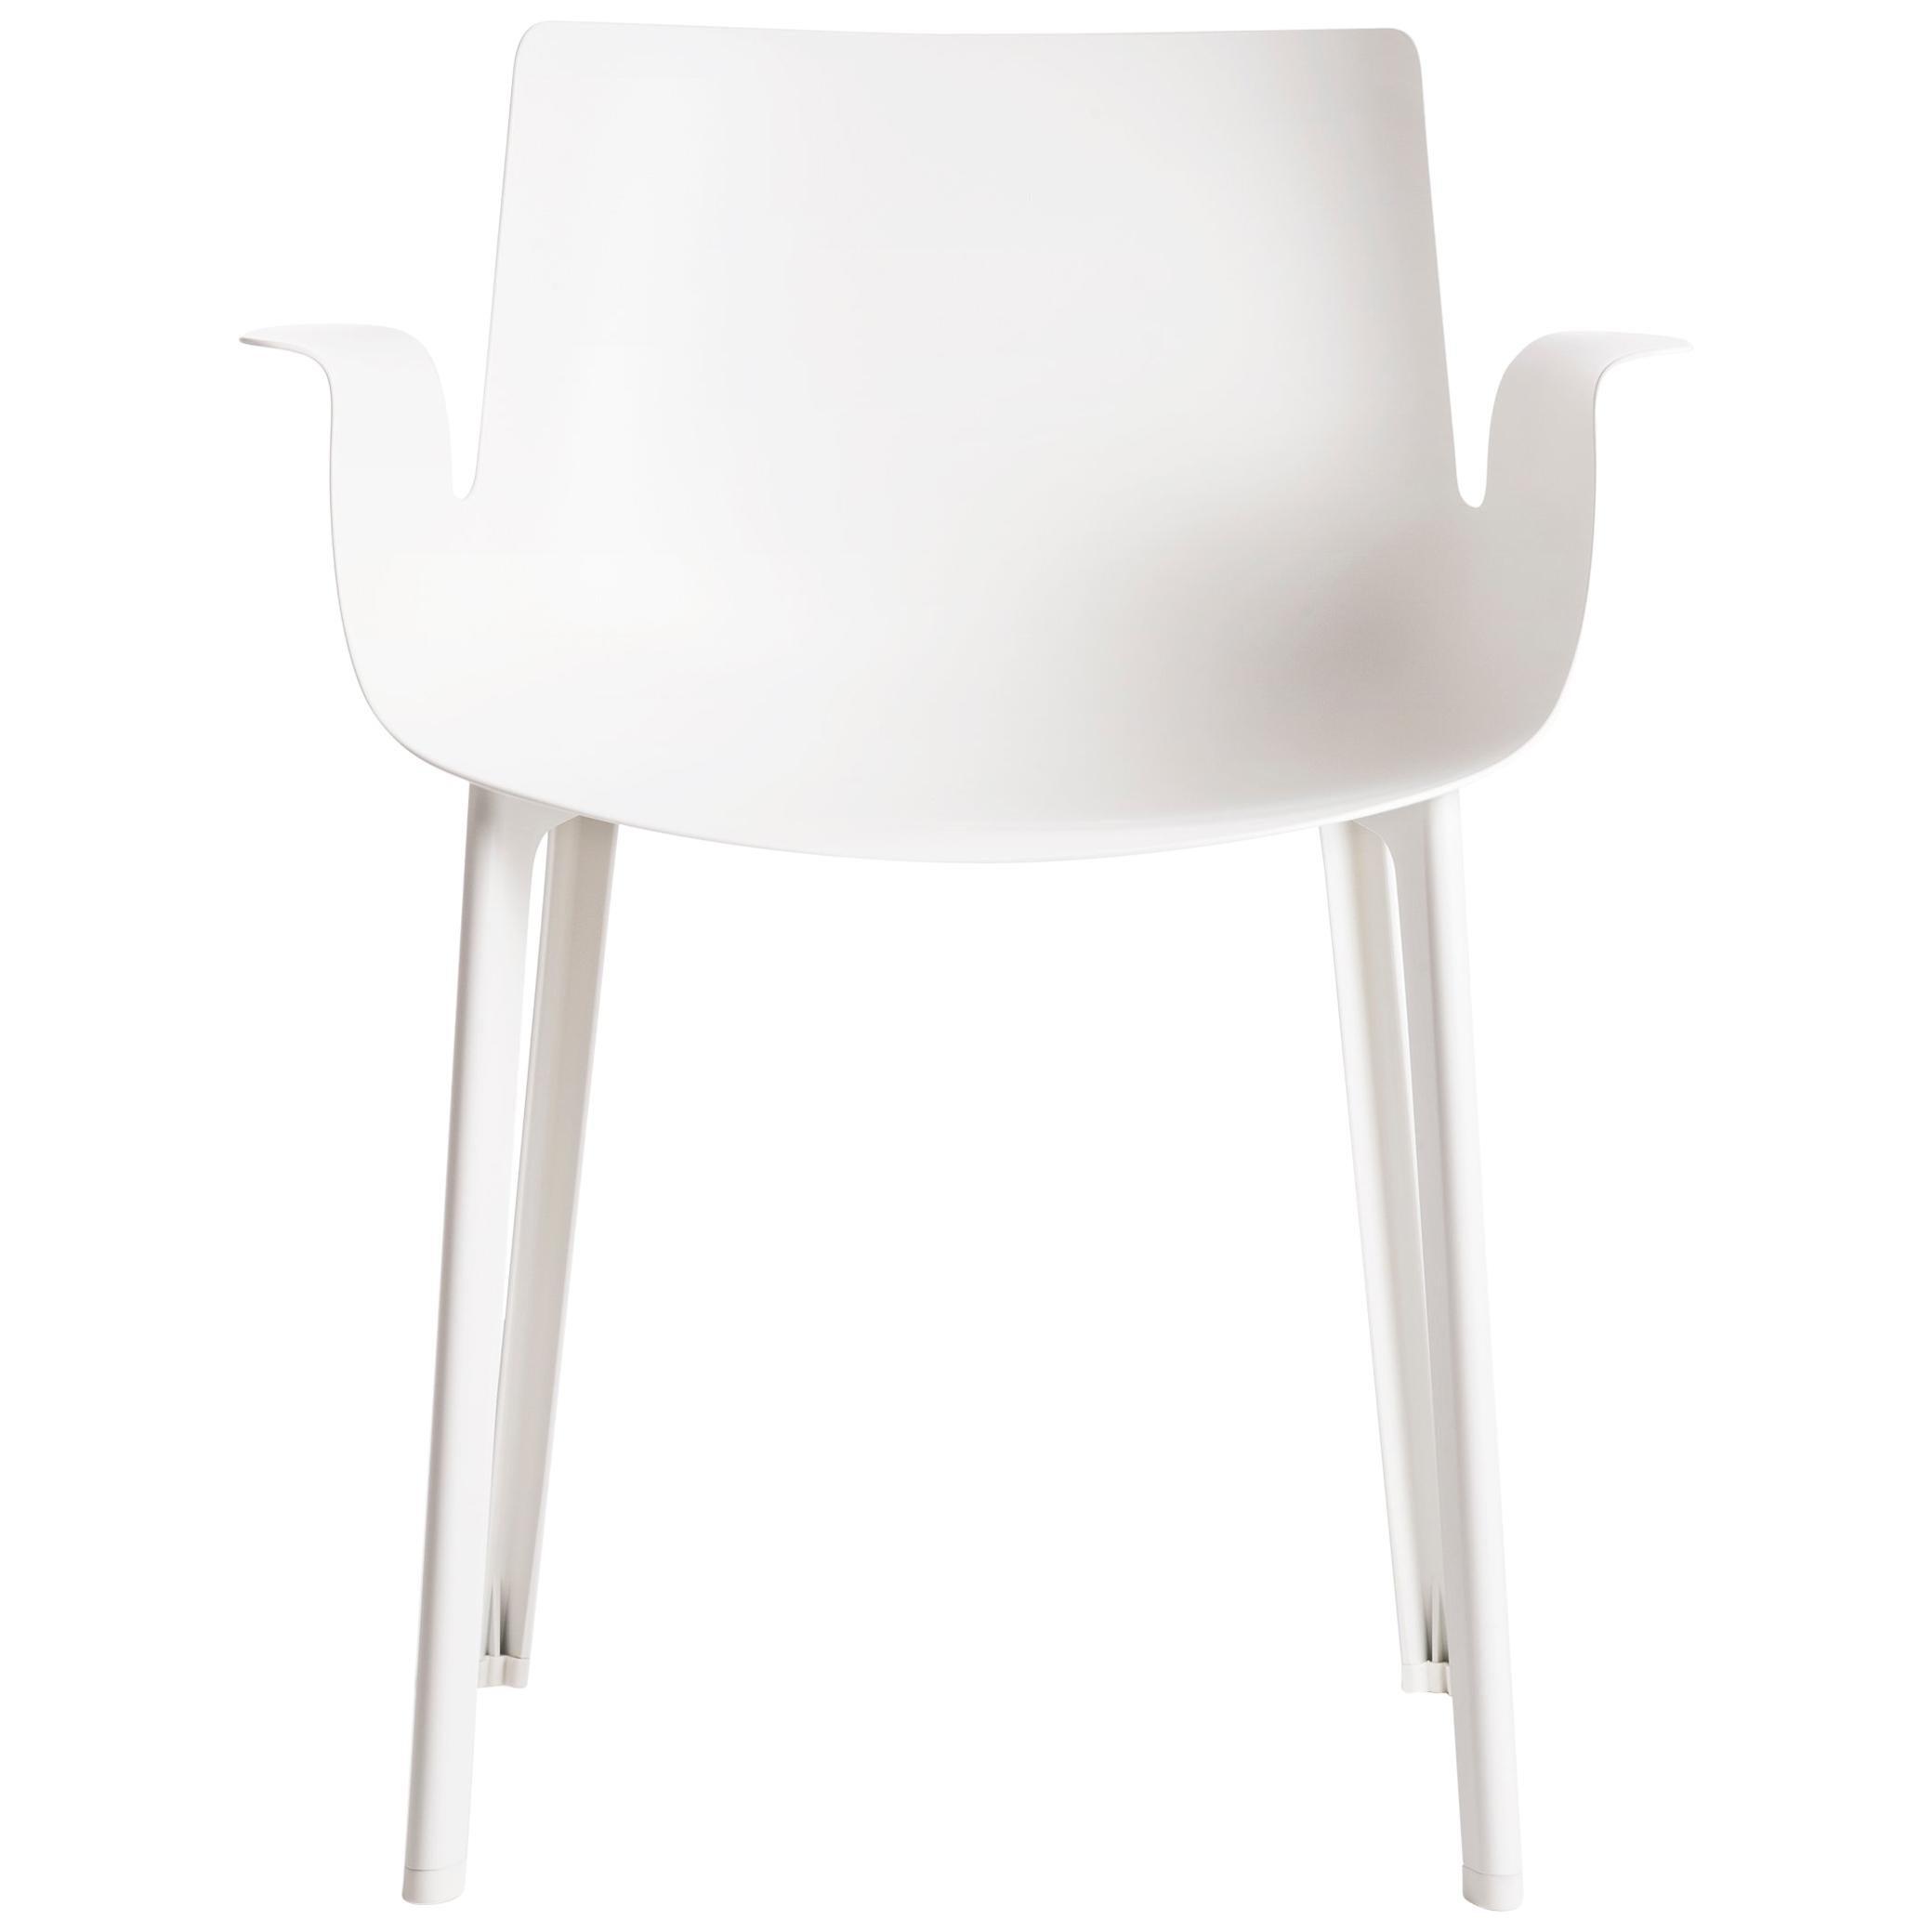 Kartell Piuma Chair in White by Piero Lissoni